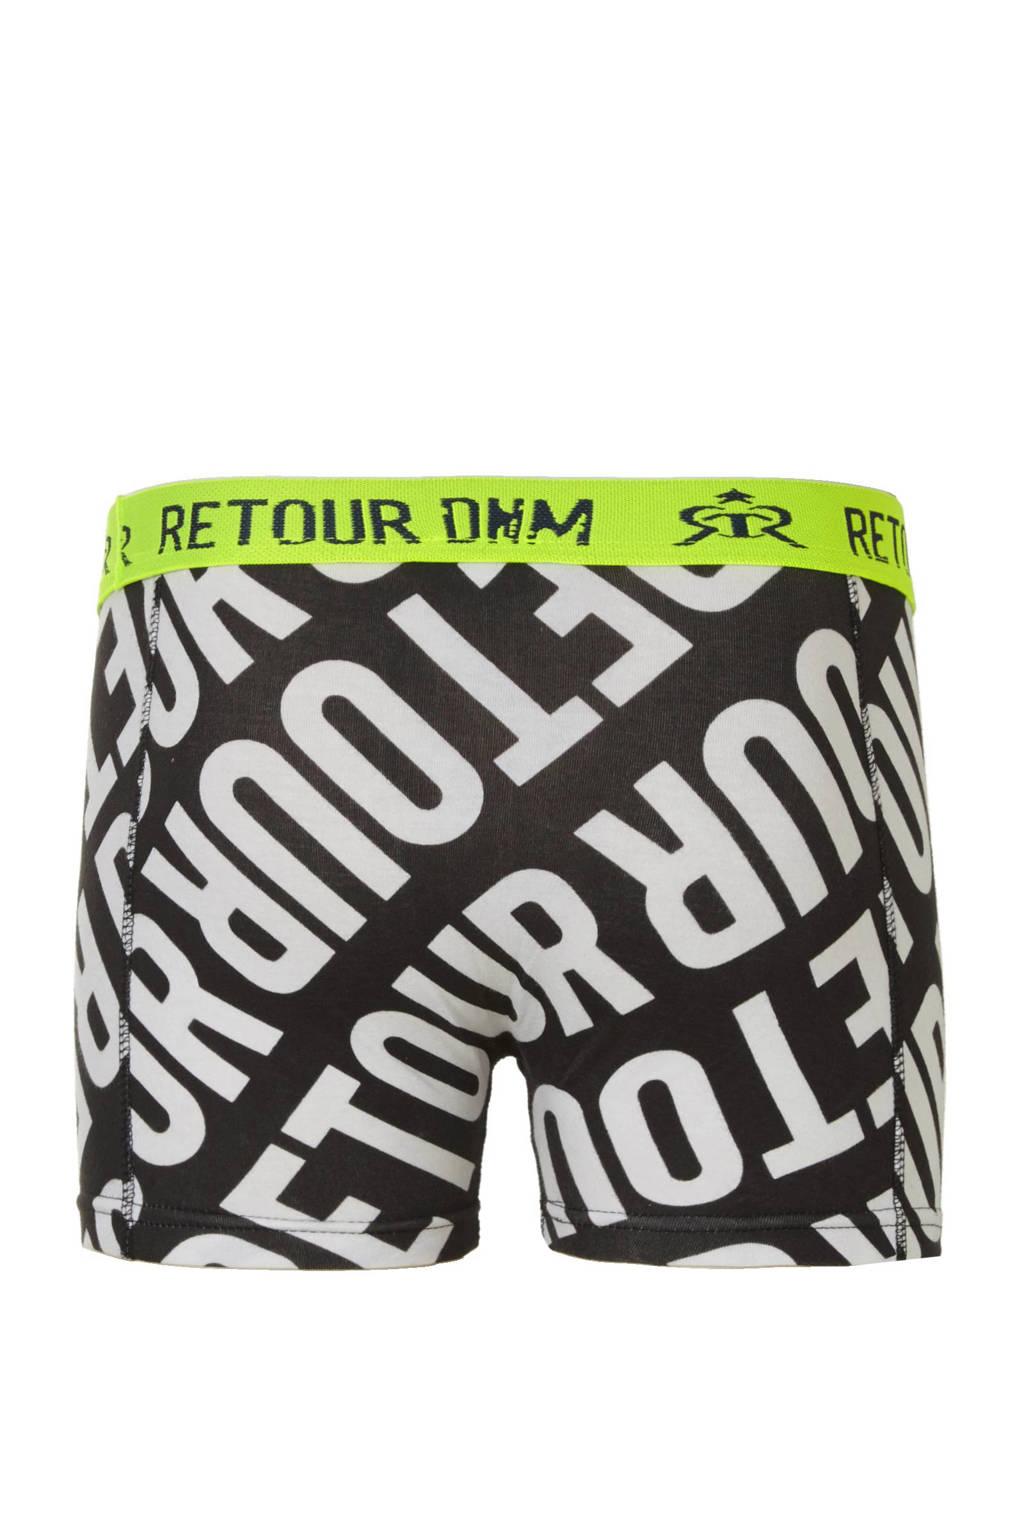 af083bfab4080e Retour Denim boxers (set van 2), Zwart/wit/blauw